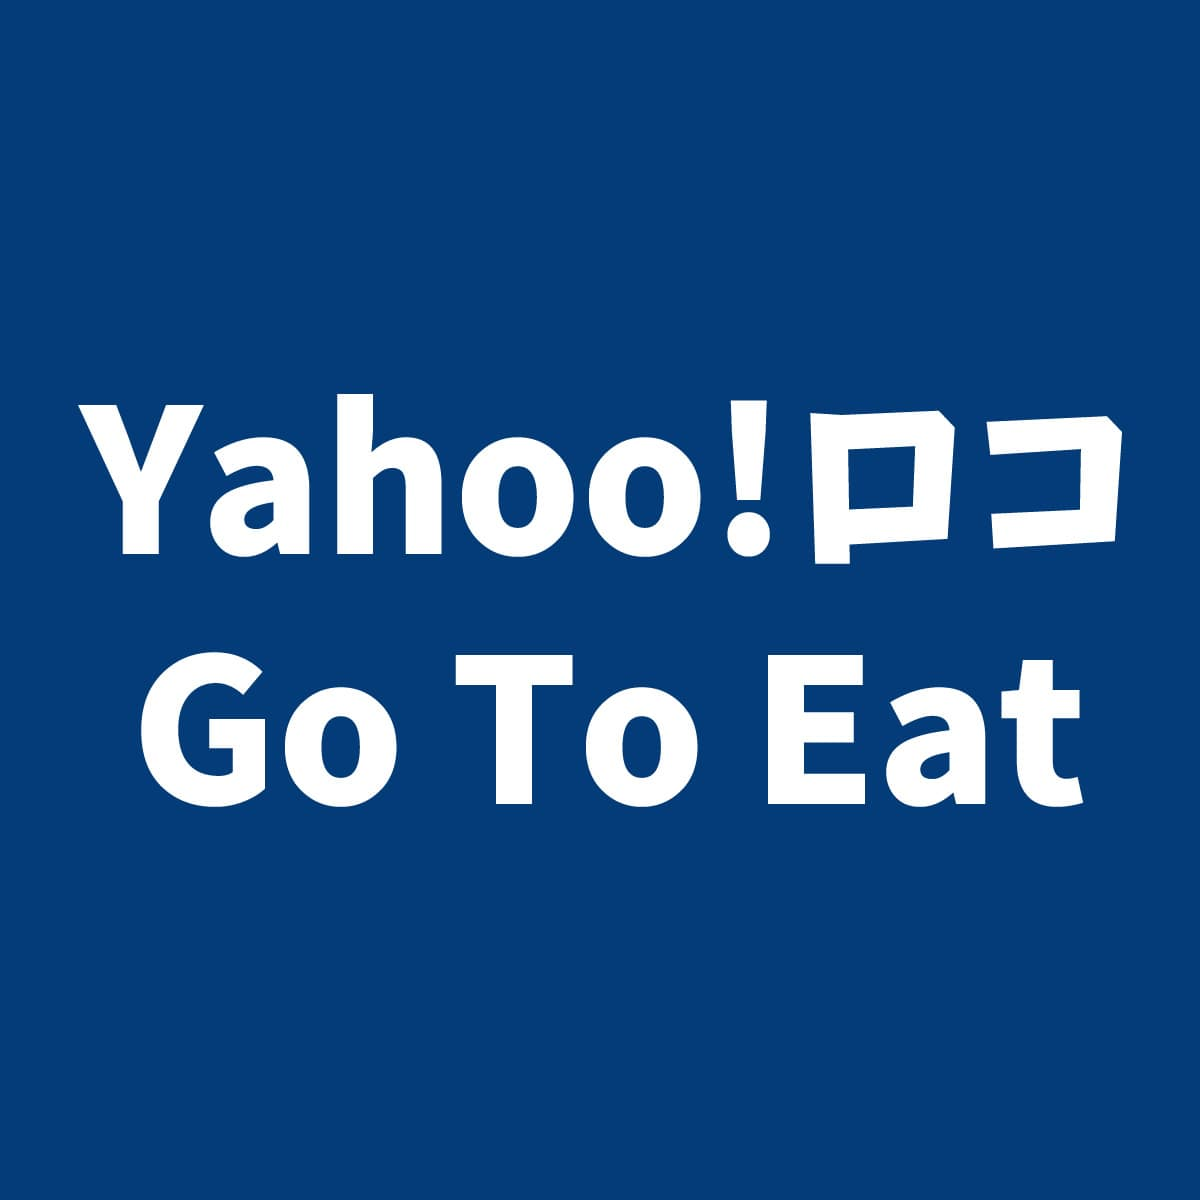 Yahoo!ロコ「Go To Eat(イート)」淡路島